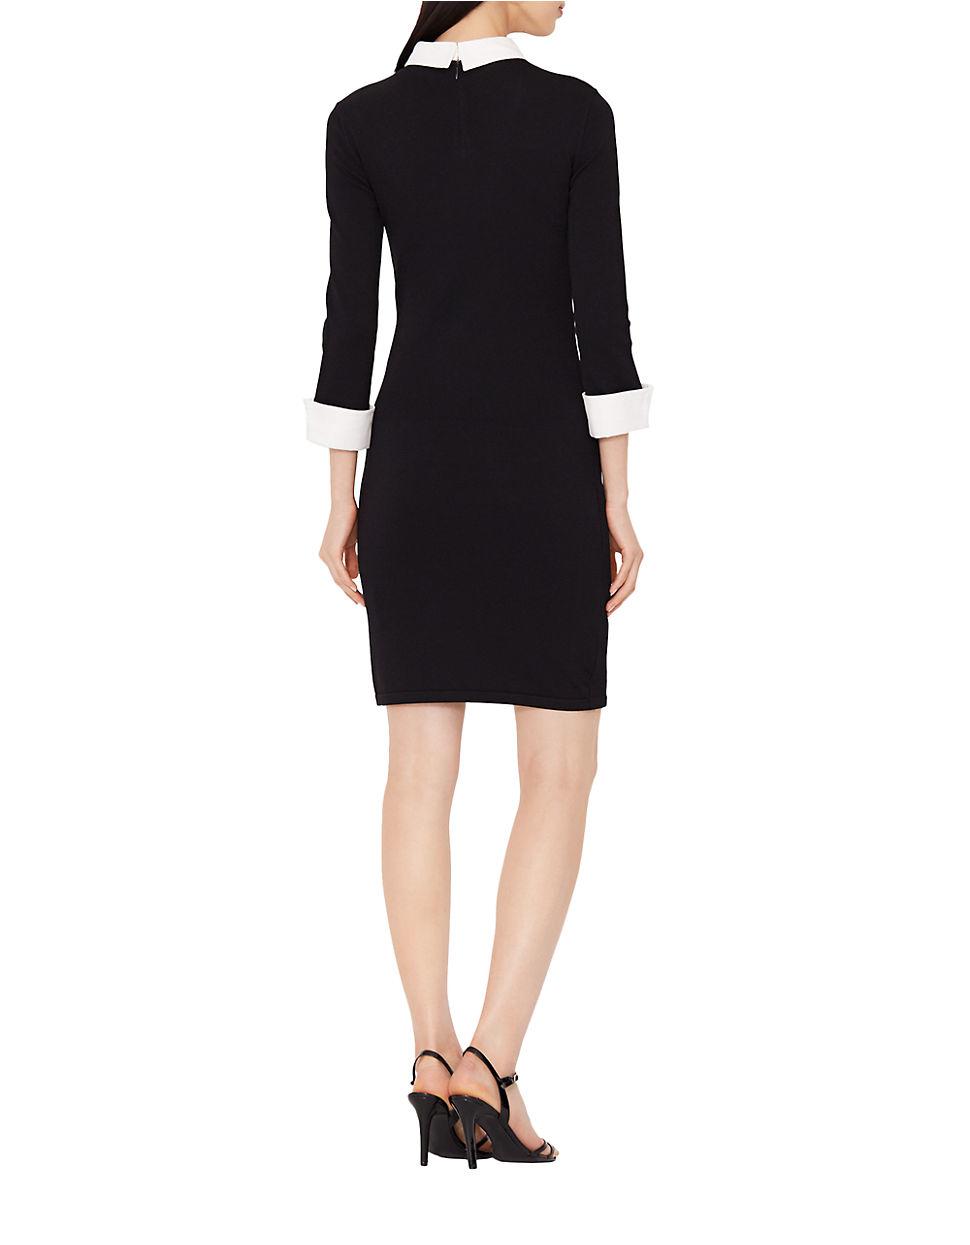 Marein – lauren ralph lauren collared sheath dress